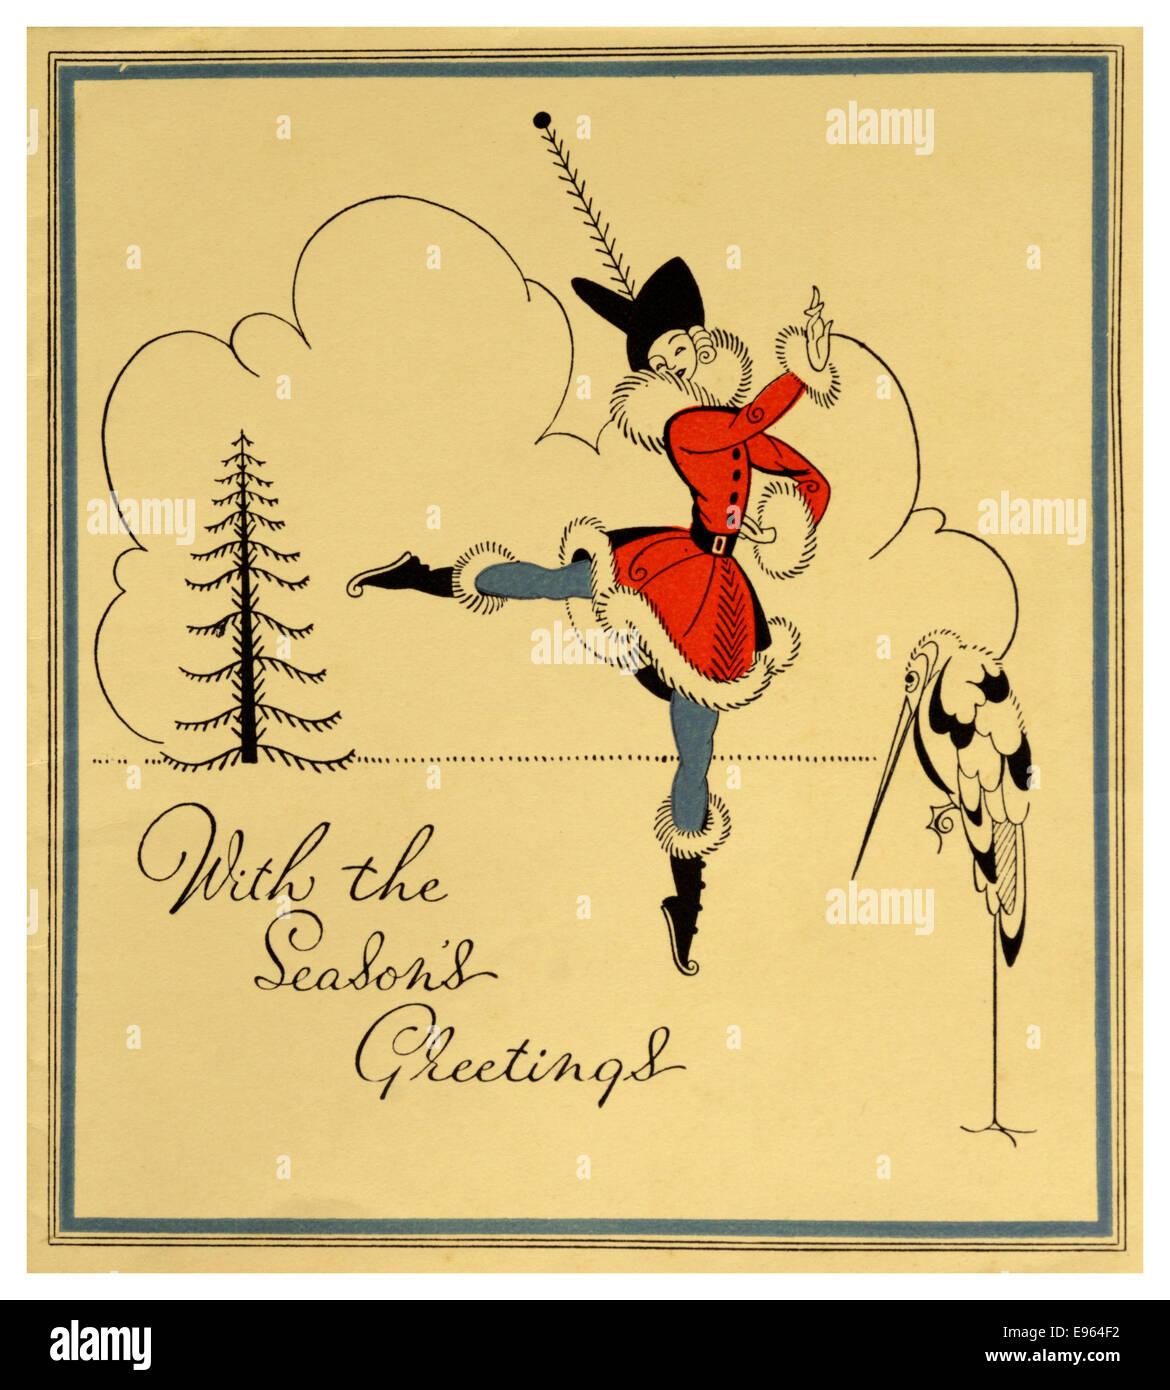 Vintage Christmas Cards Stock Photos Vintage Christmas Cards Stock